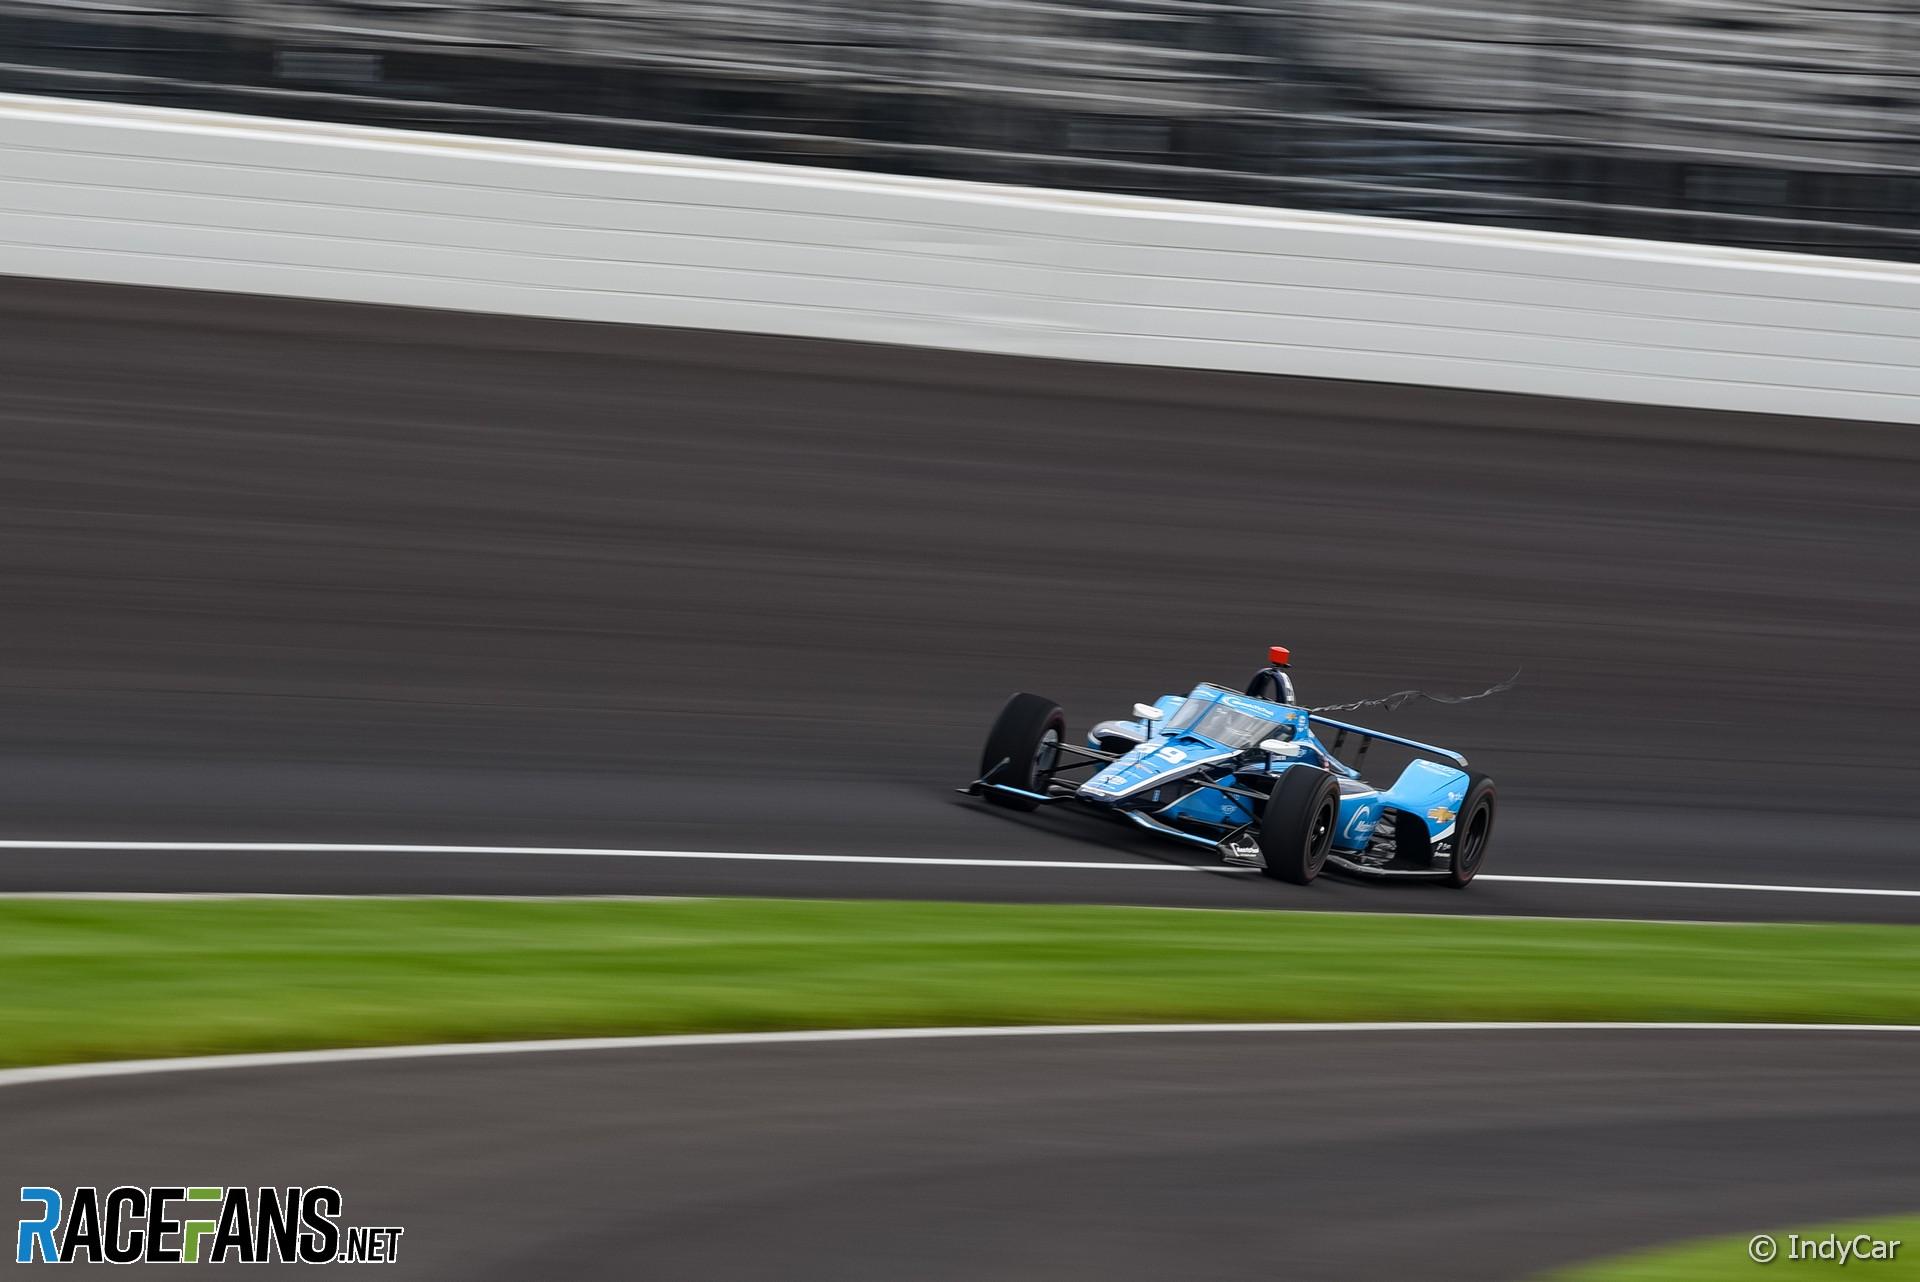 Max Chilton, Carlin, IndyCar, Indianapolis Motor Speedway, 2021